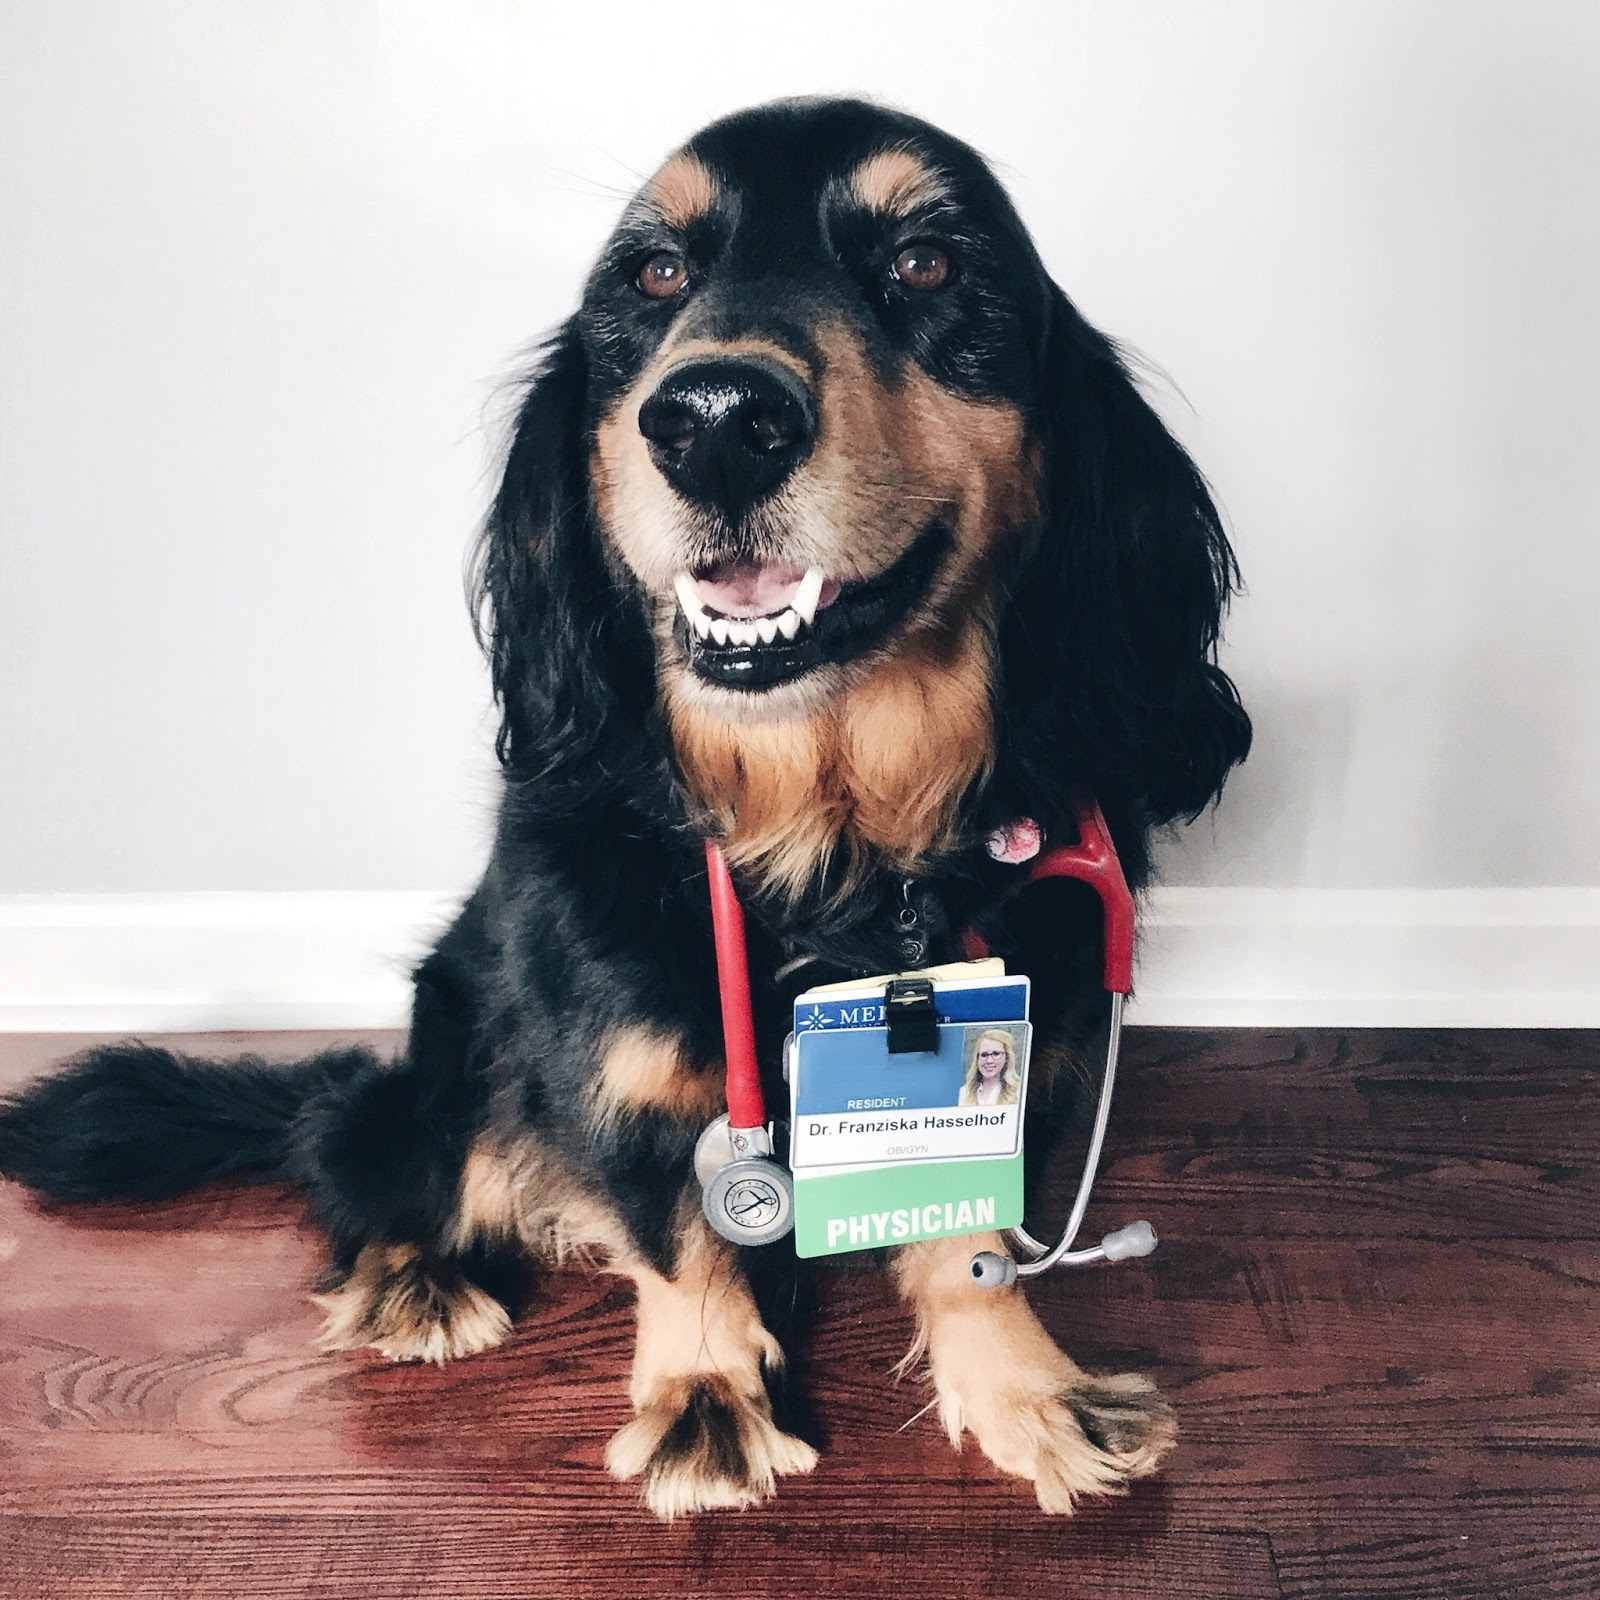 Franish: having a dog in medical school & residency